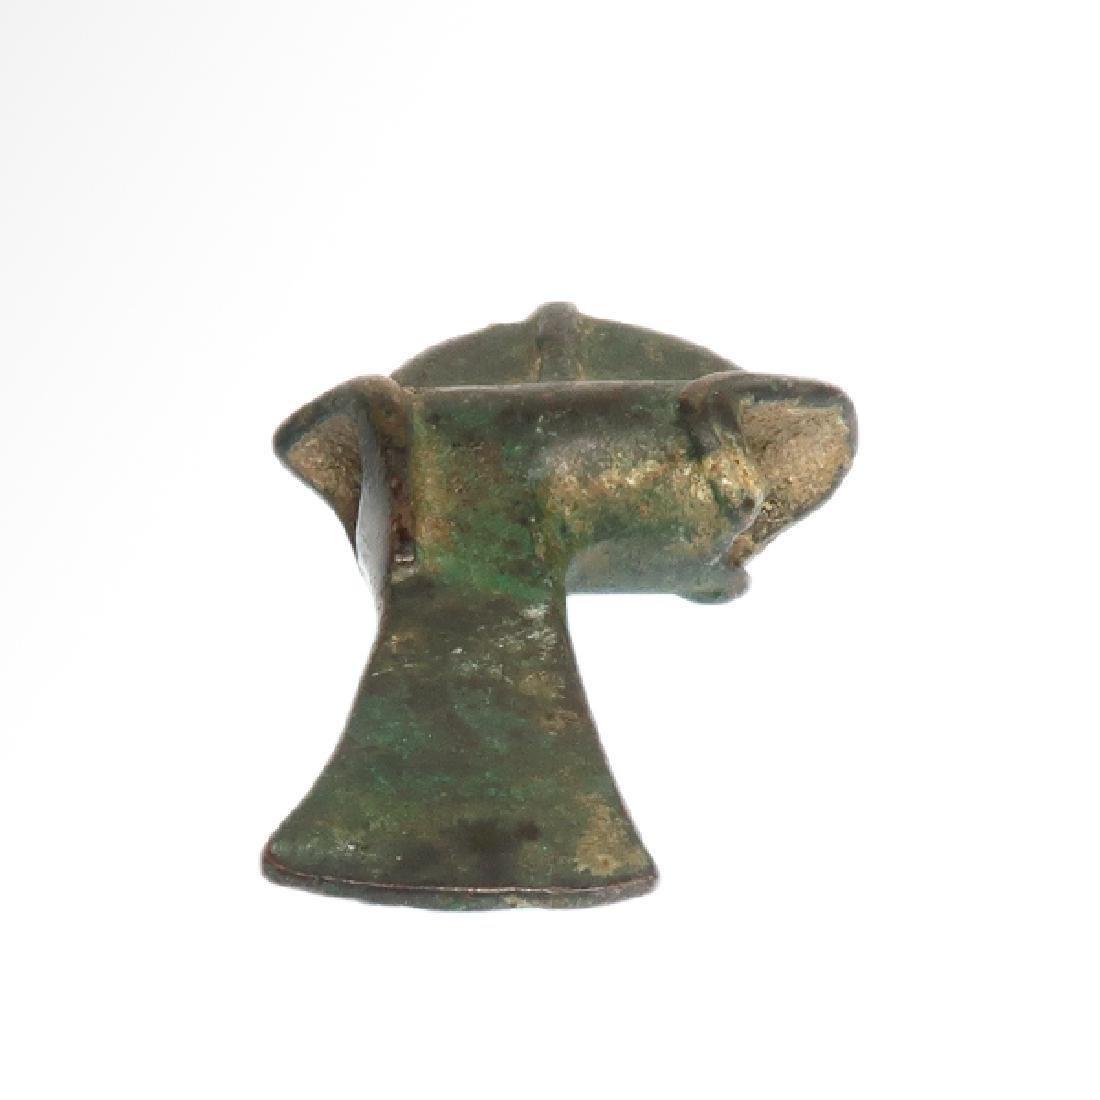 Luristan Bronze Axe, c. 9th Century B.C. - 4